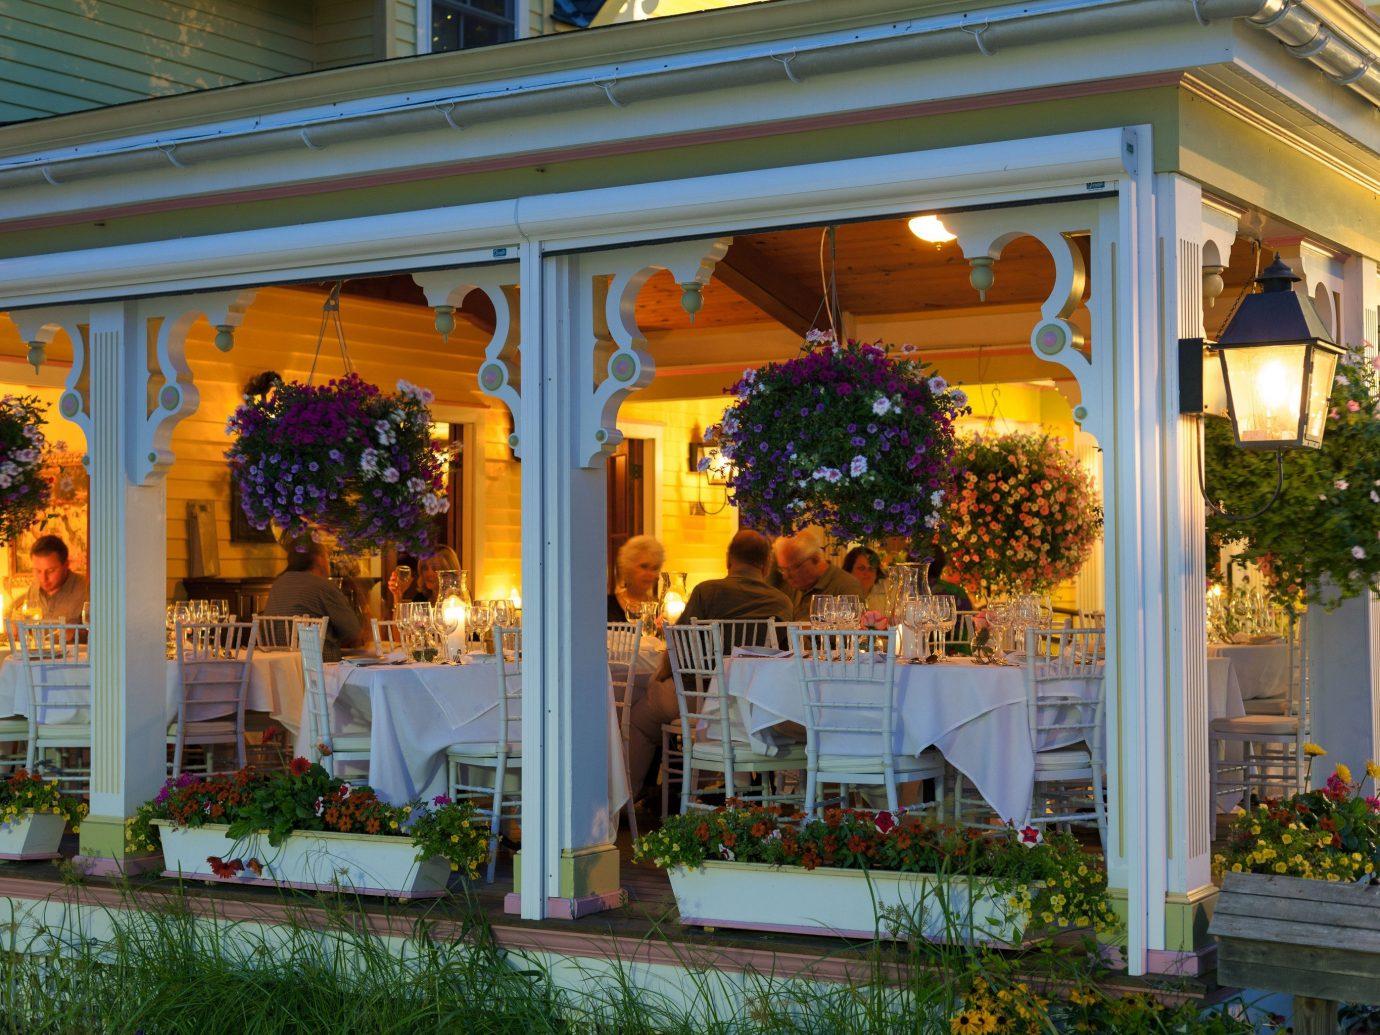 Trip Ideas outdoor building Resort home estate floristry meal restaurant facade flower palace porch